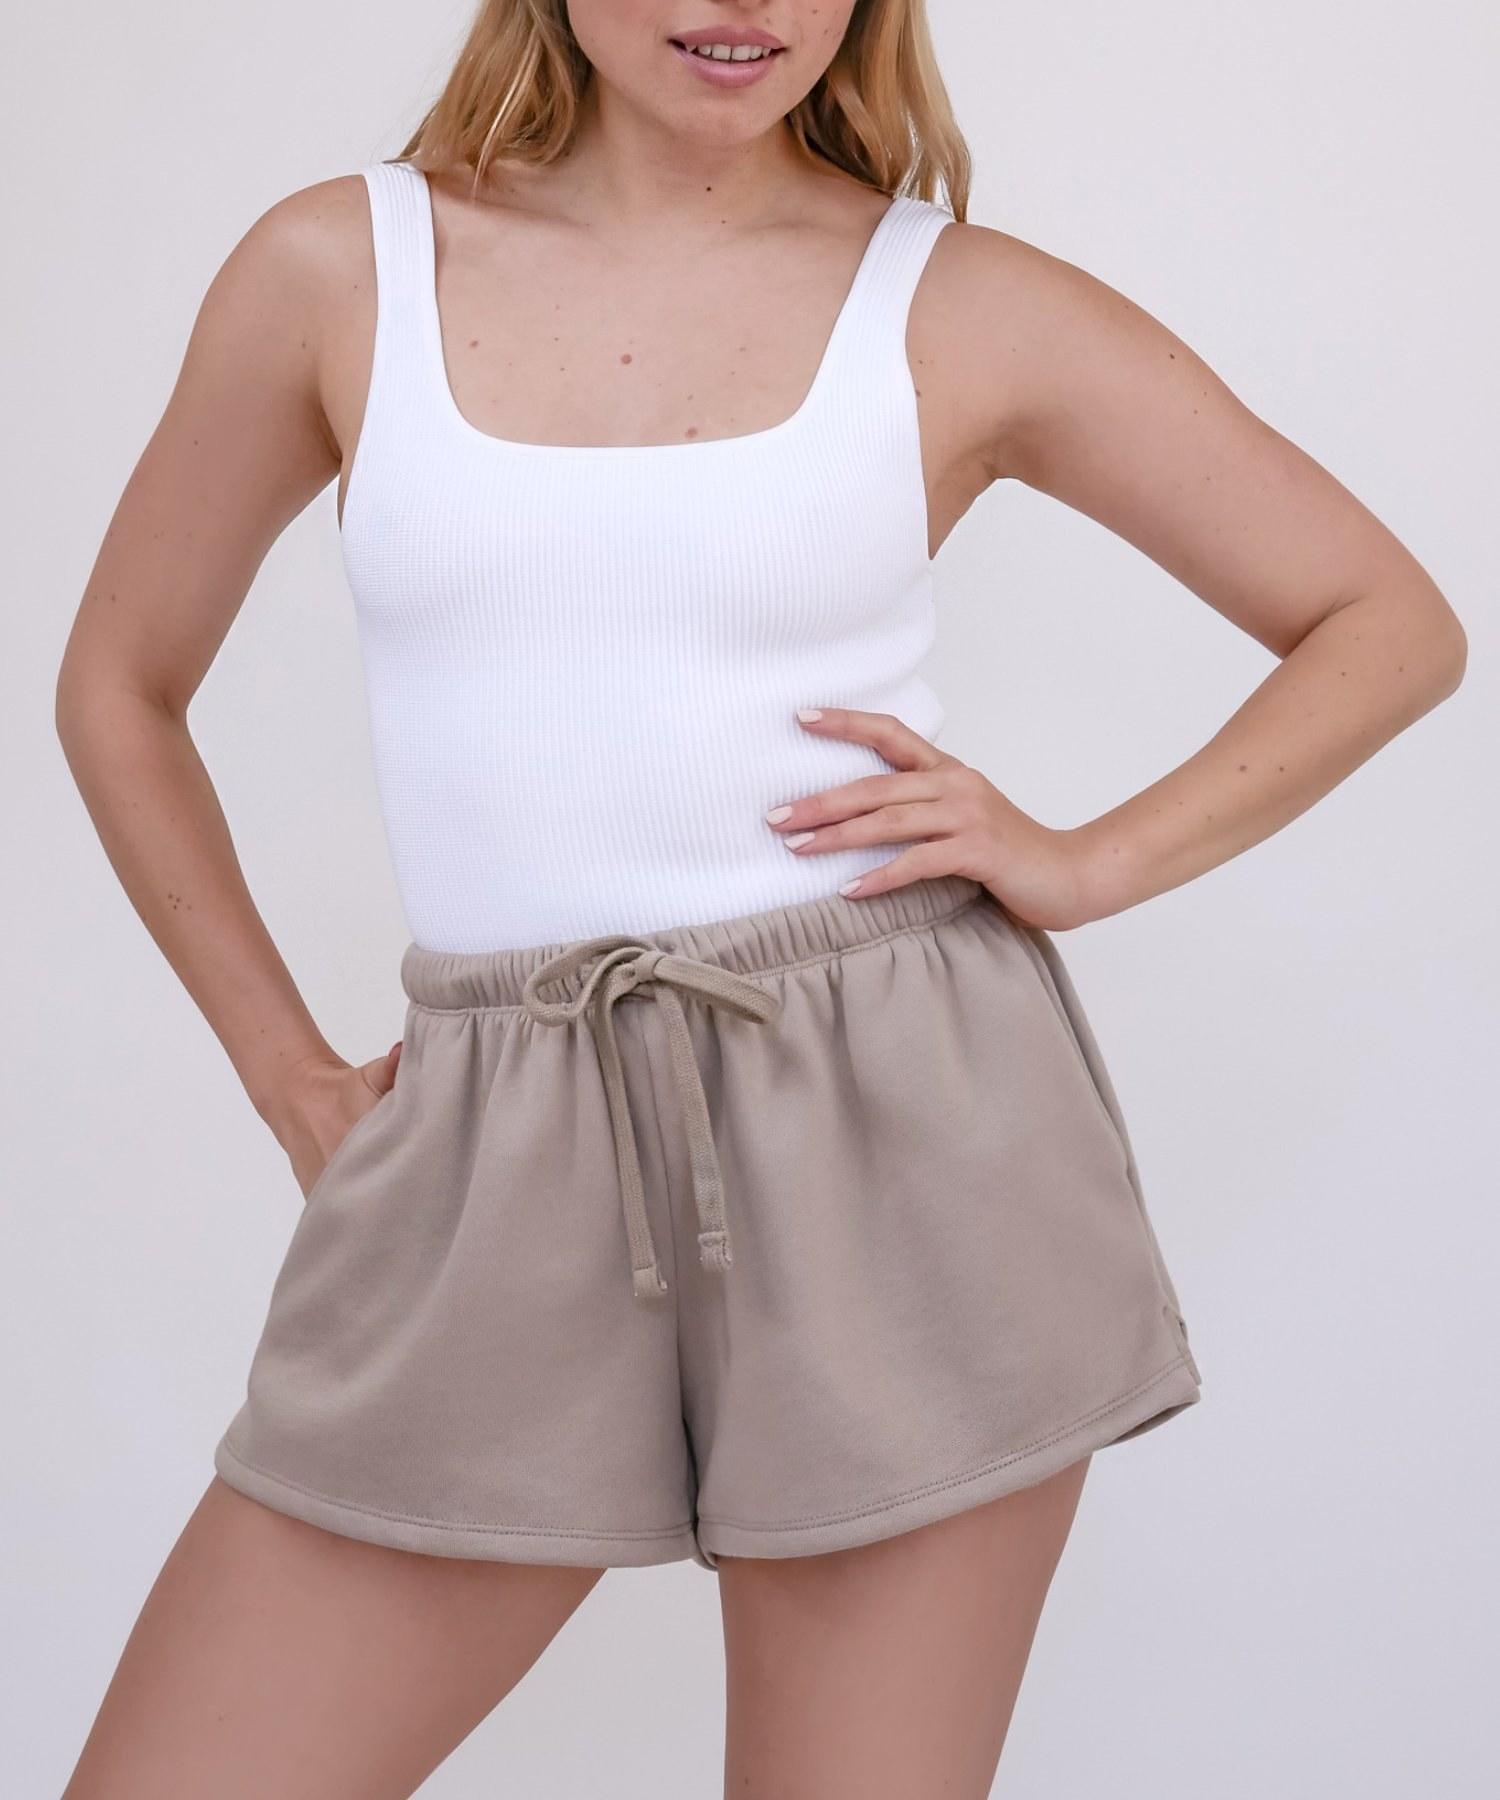 Model wearing shorts